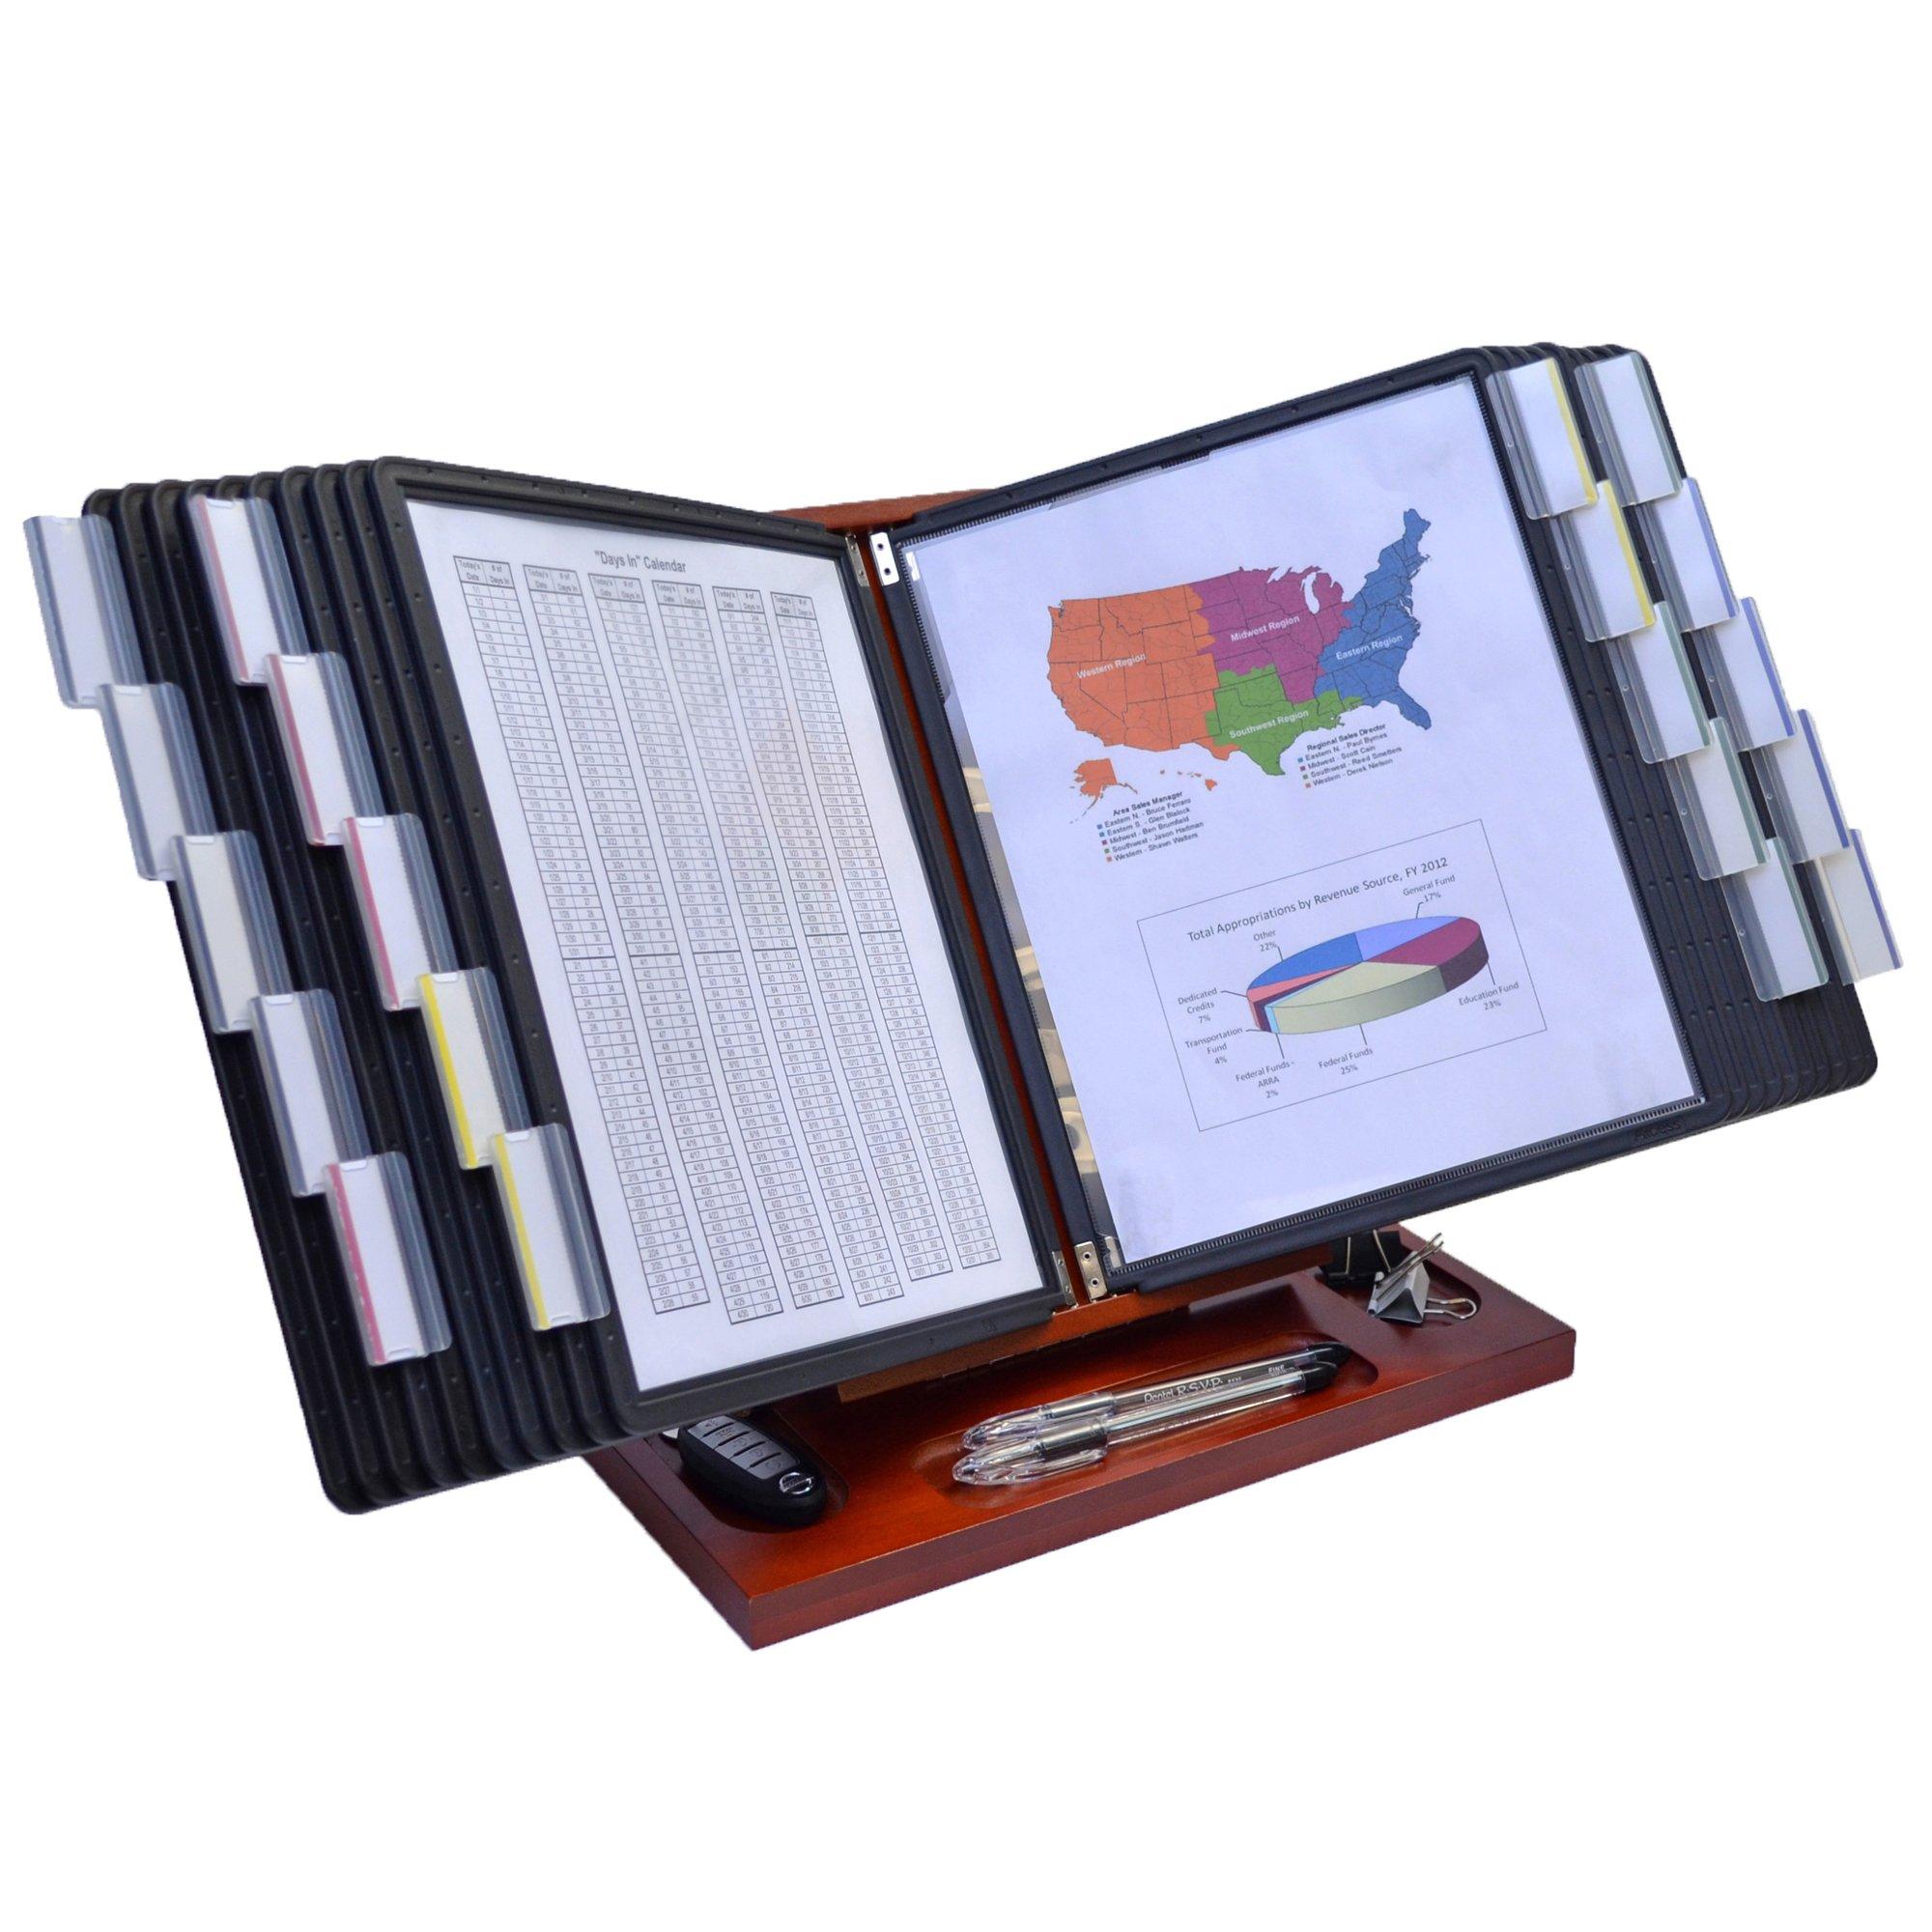 WoodWorx 20-Pocket Desk Reference Organizer, (Cherry w/ Black Pockets)